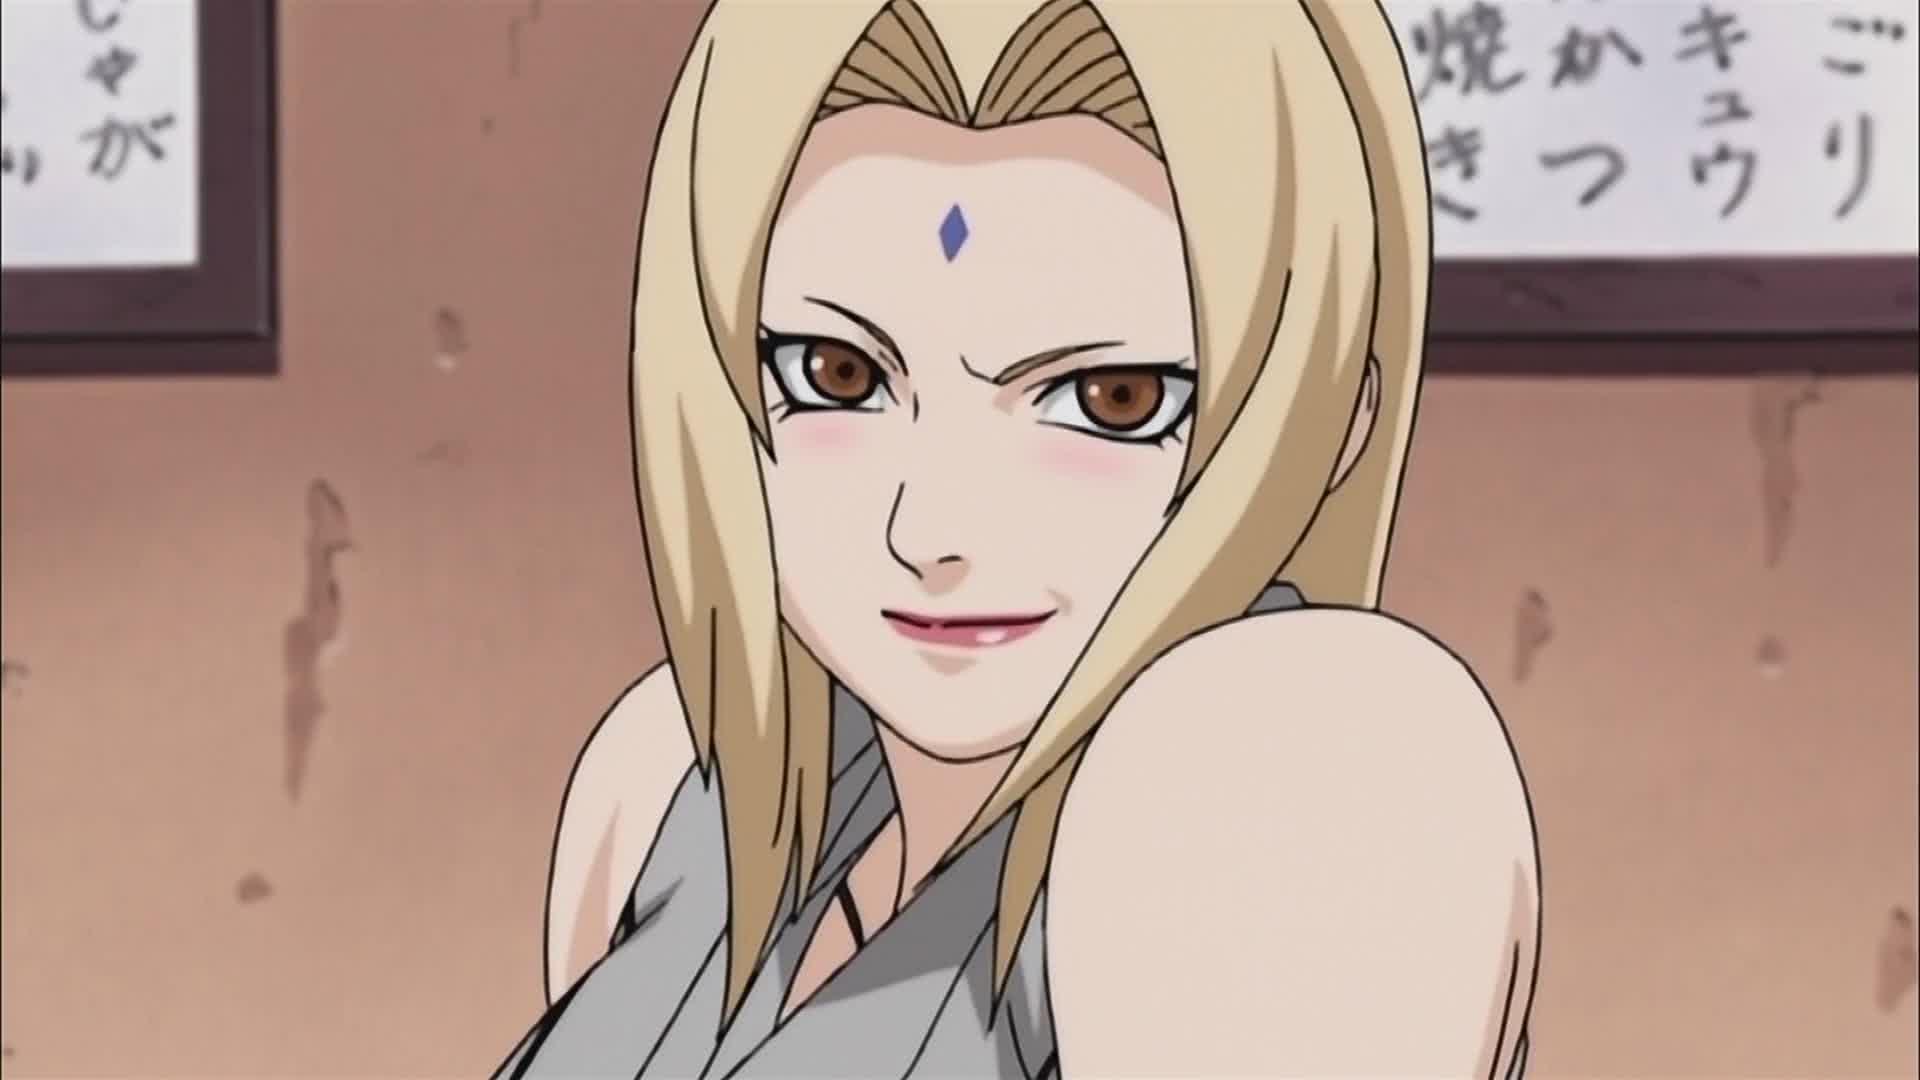 Jolie Jule revela un cosplay de Tsunade del anime Naruto